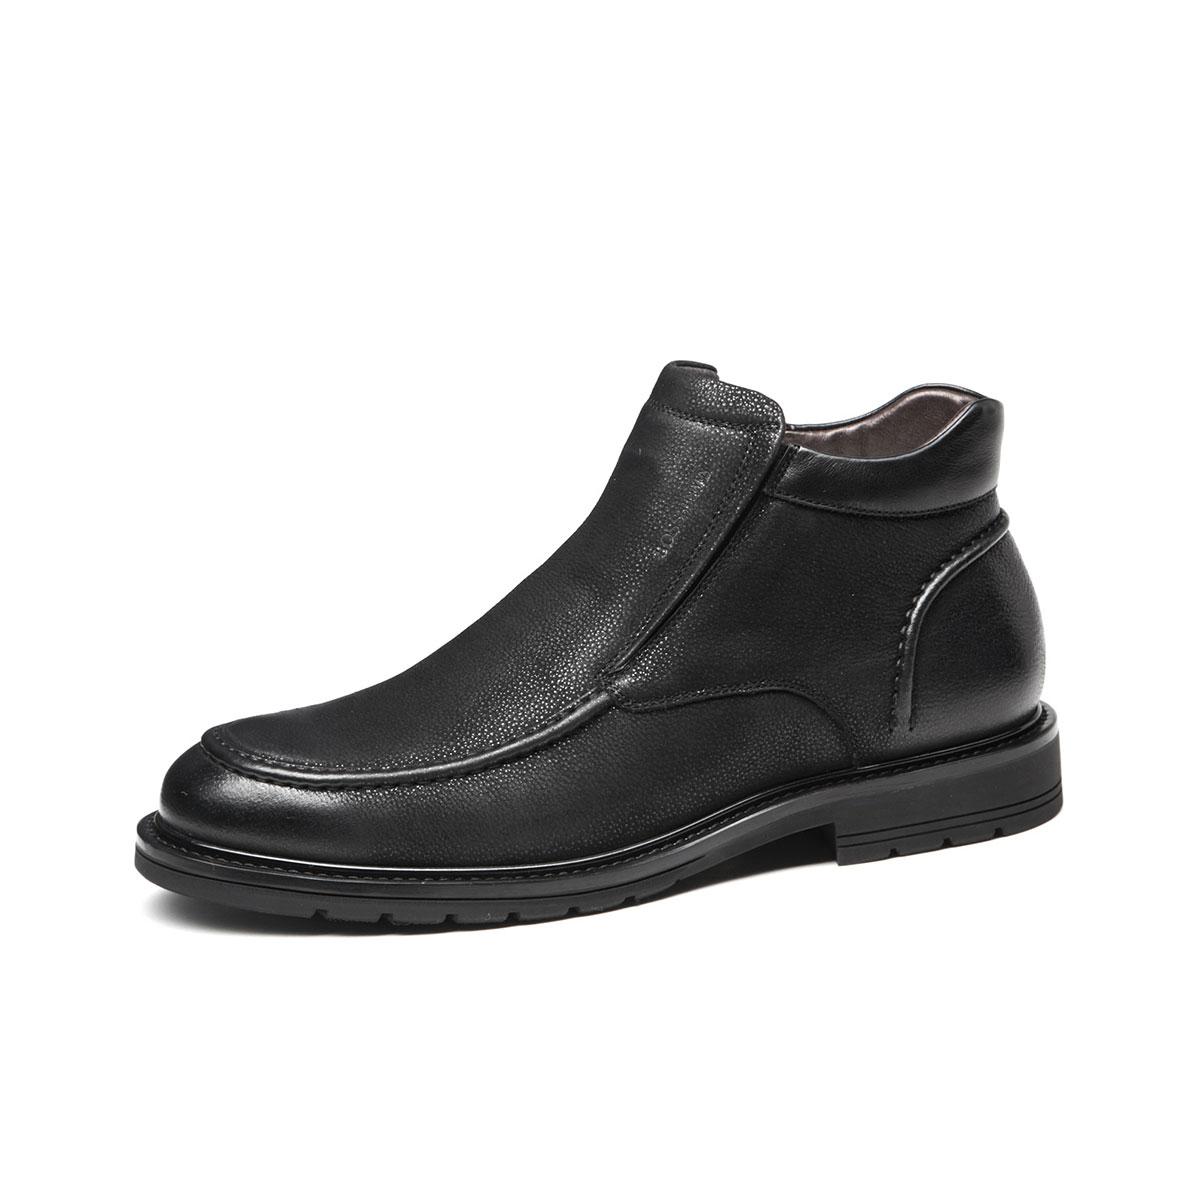 BOSSSUNWEN冬季男鞋牛皮加绒高帮男靴保暖男雪地靴男士棉鞋男士靴子高帮男鞋B12NBR111A